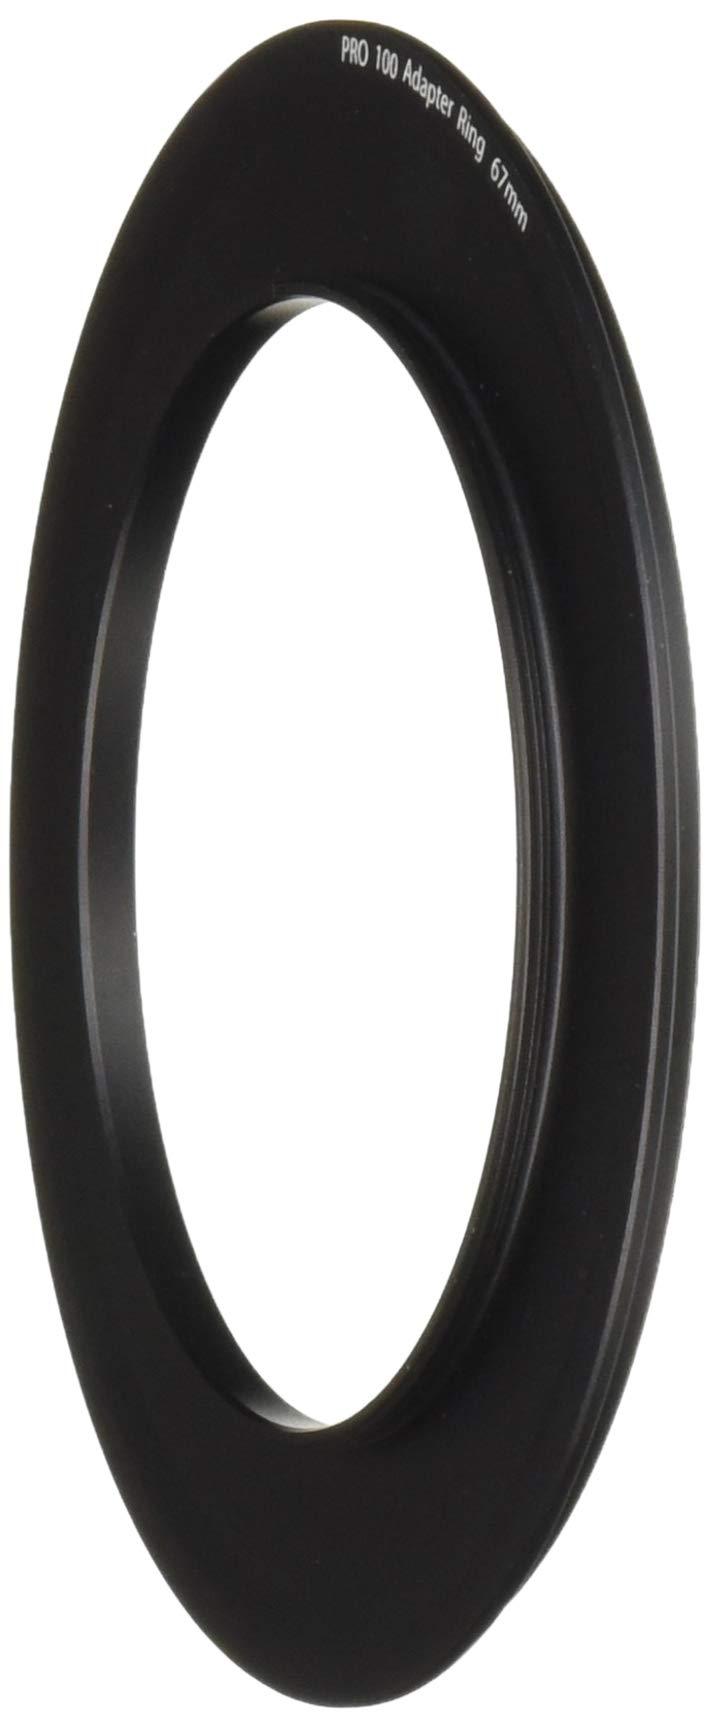 Tiffen Step Ring Camera Lens Square Filter, Black (PRO10067AR) by Tiffen